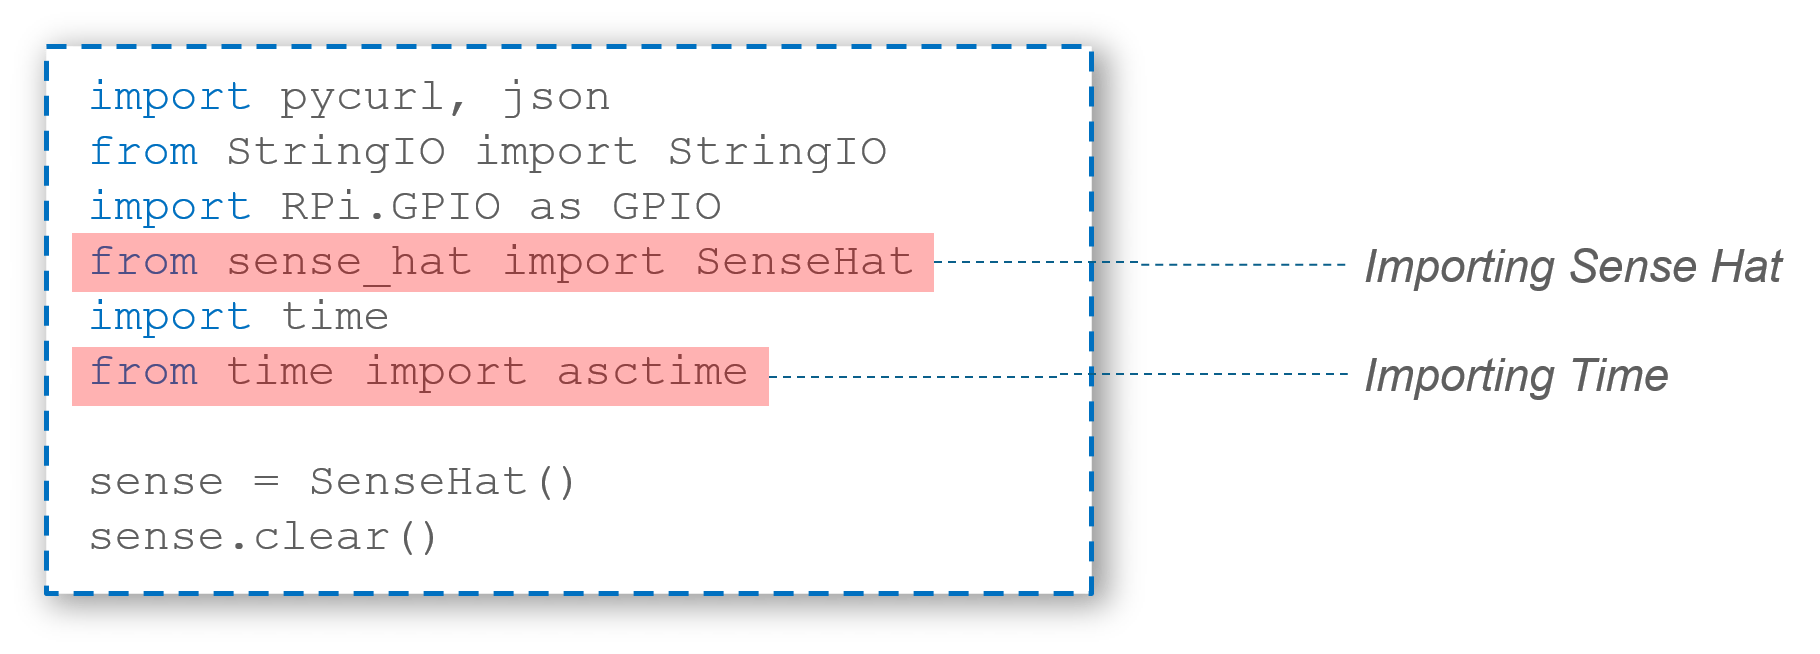 Importing Module in Python - IoT Tutorial - Edureka